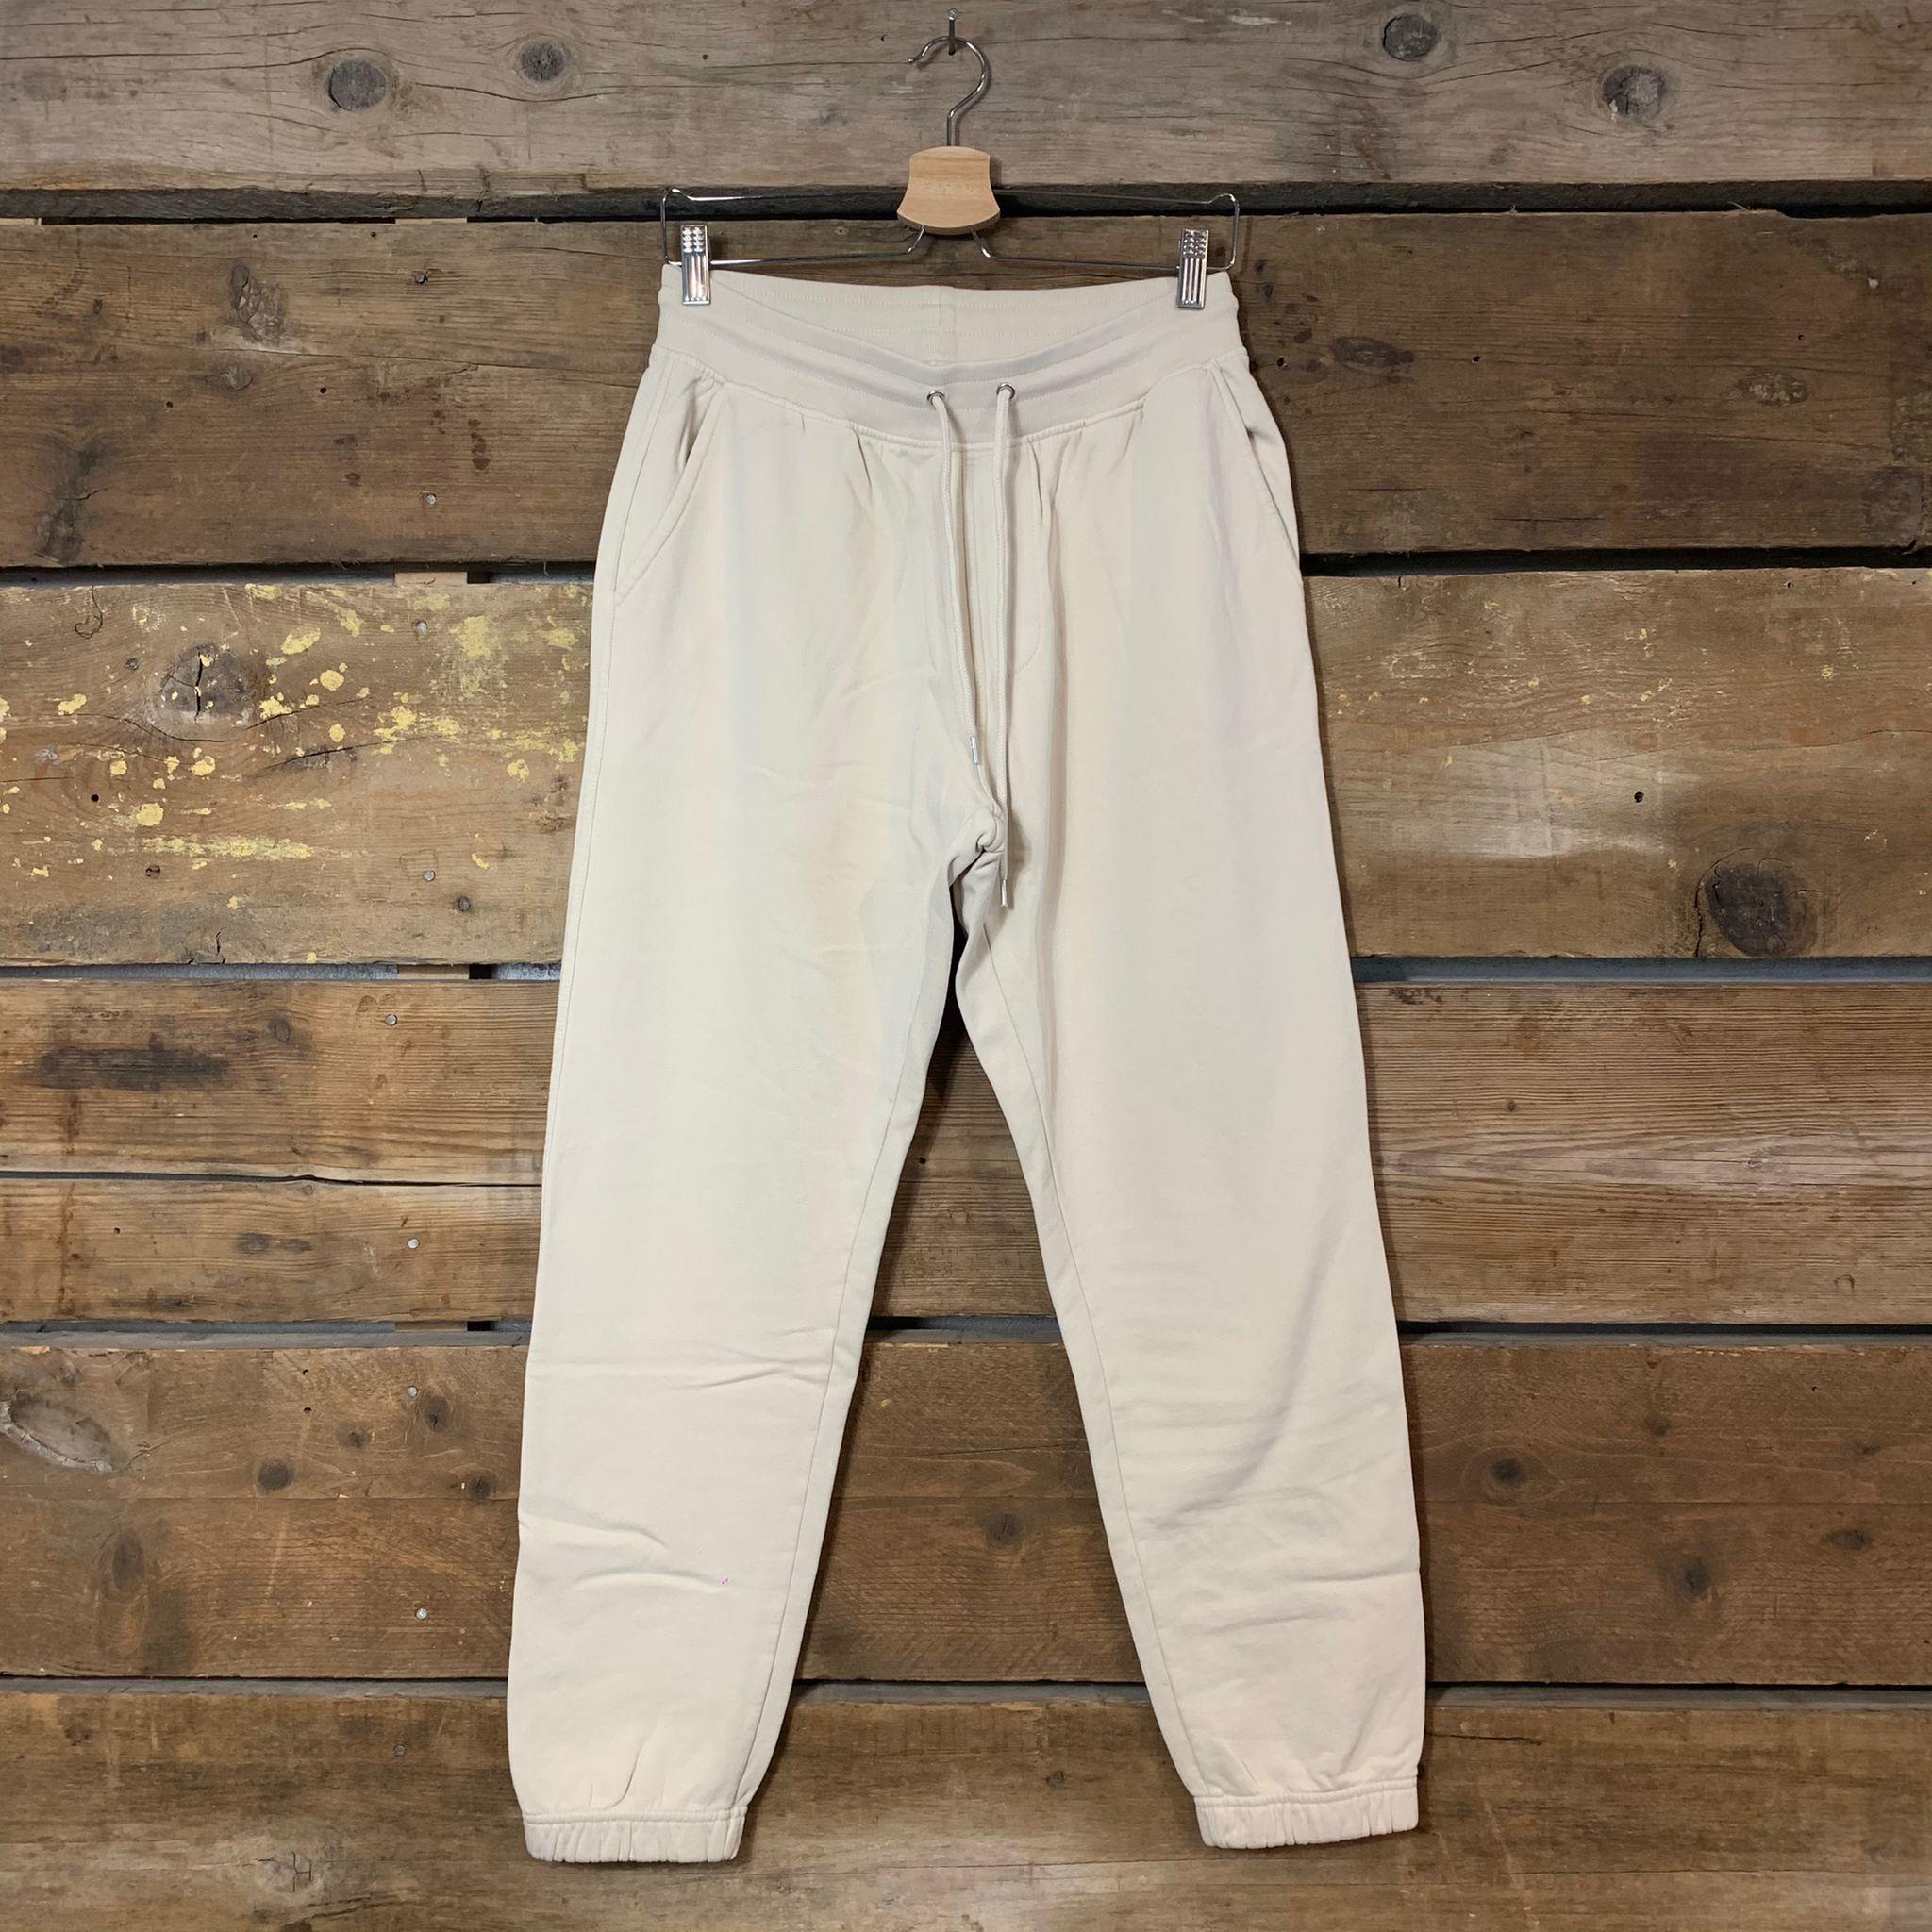 Pantalone Colorful Standard 100% Organic Cotton Avorio